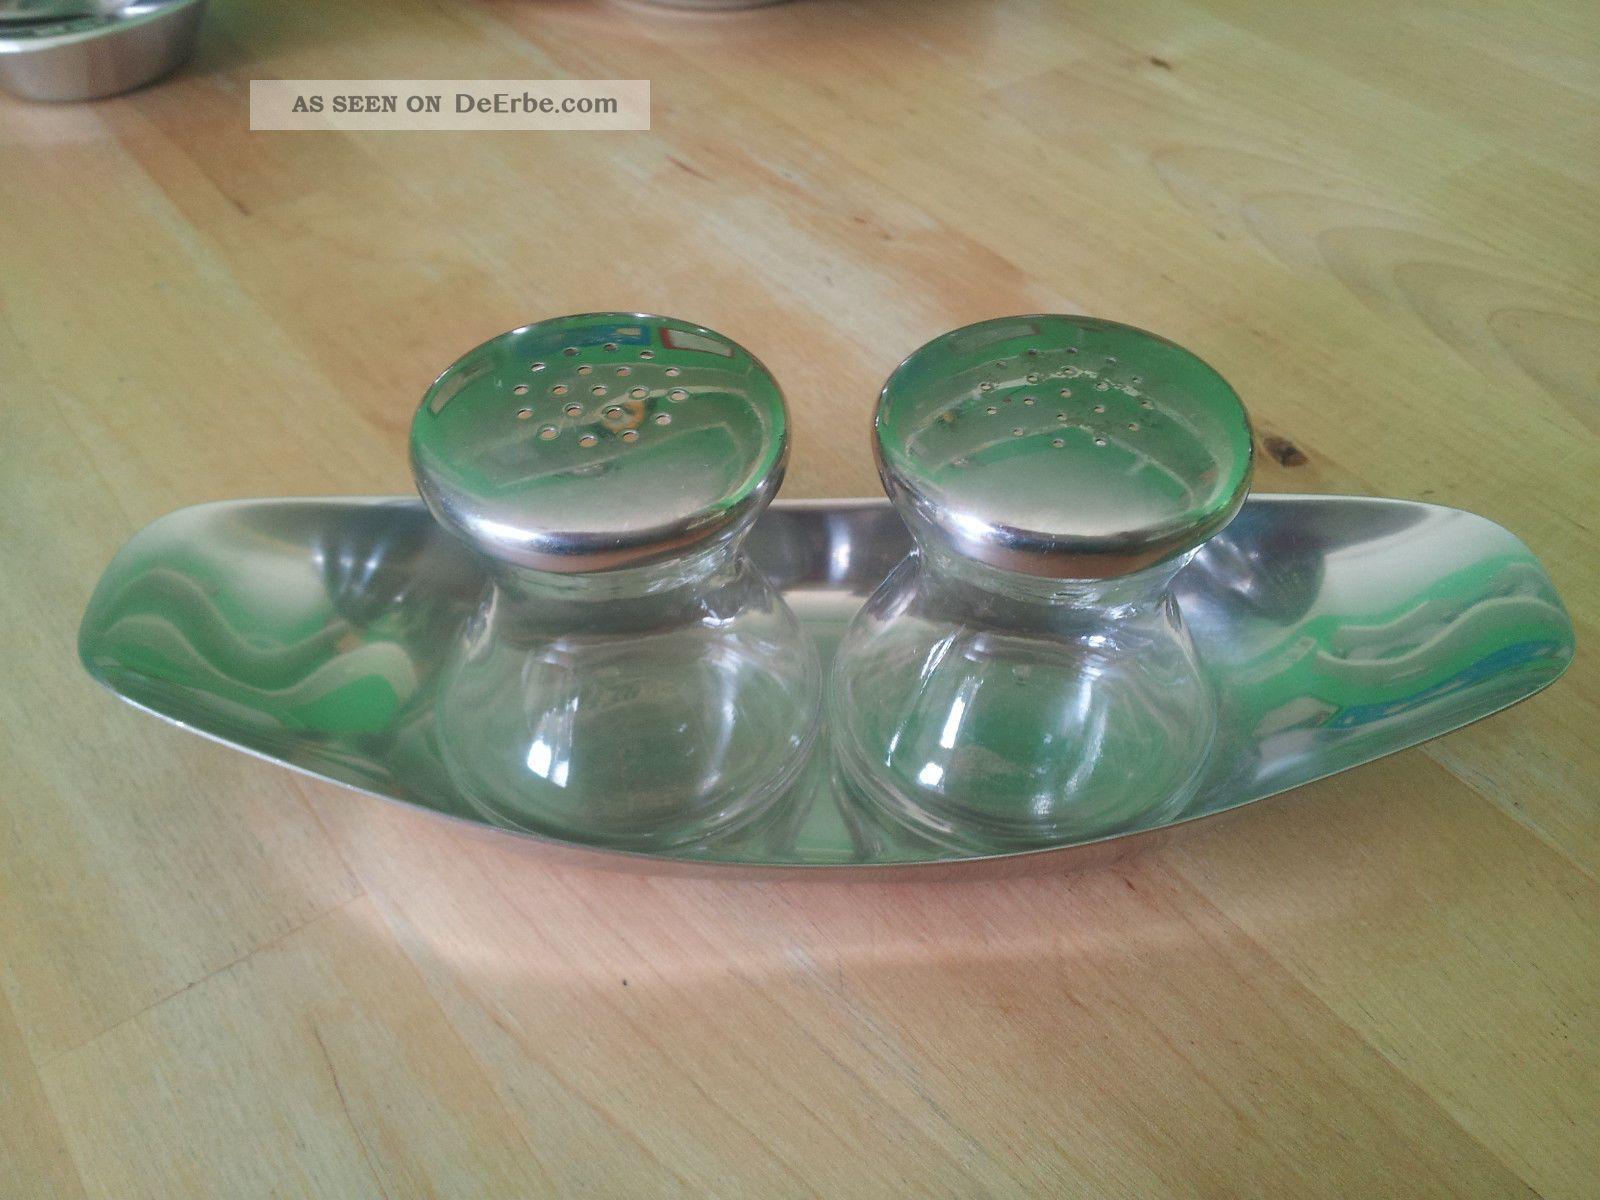 wmf wagenfeld max und moritz salz pfeffer cromagan glas. Black Bedroom Furniture Sets. Home Design Ideas